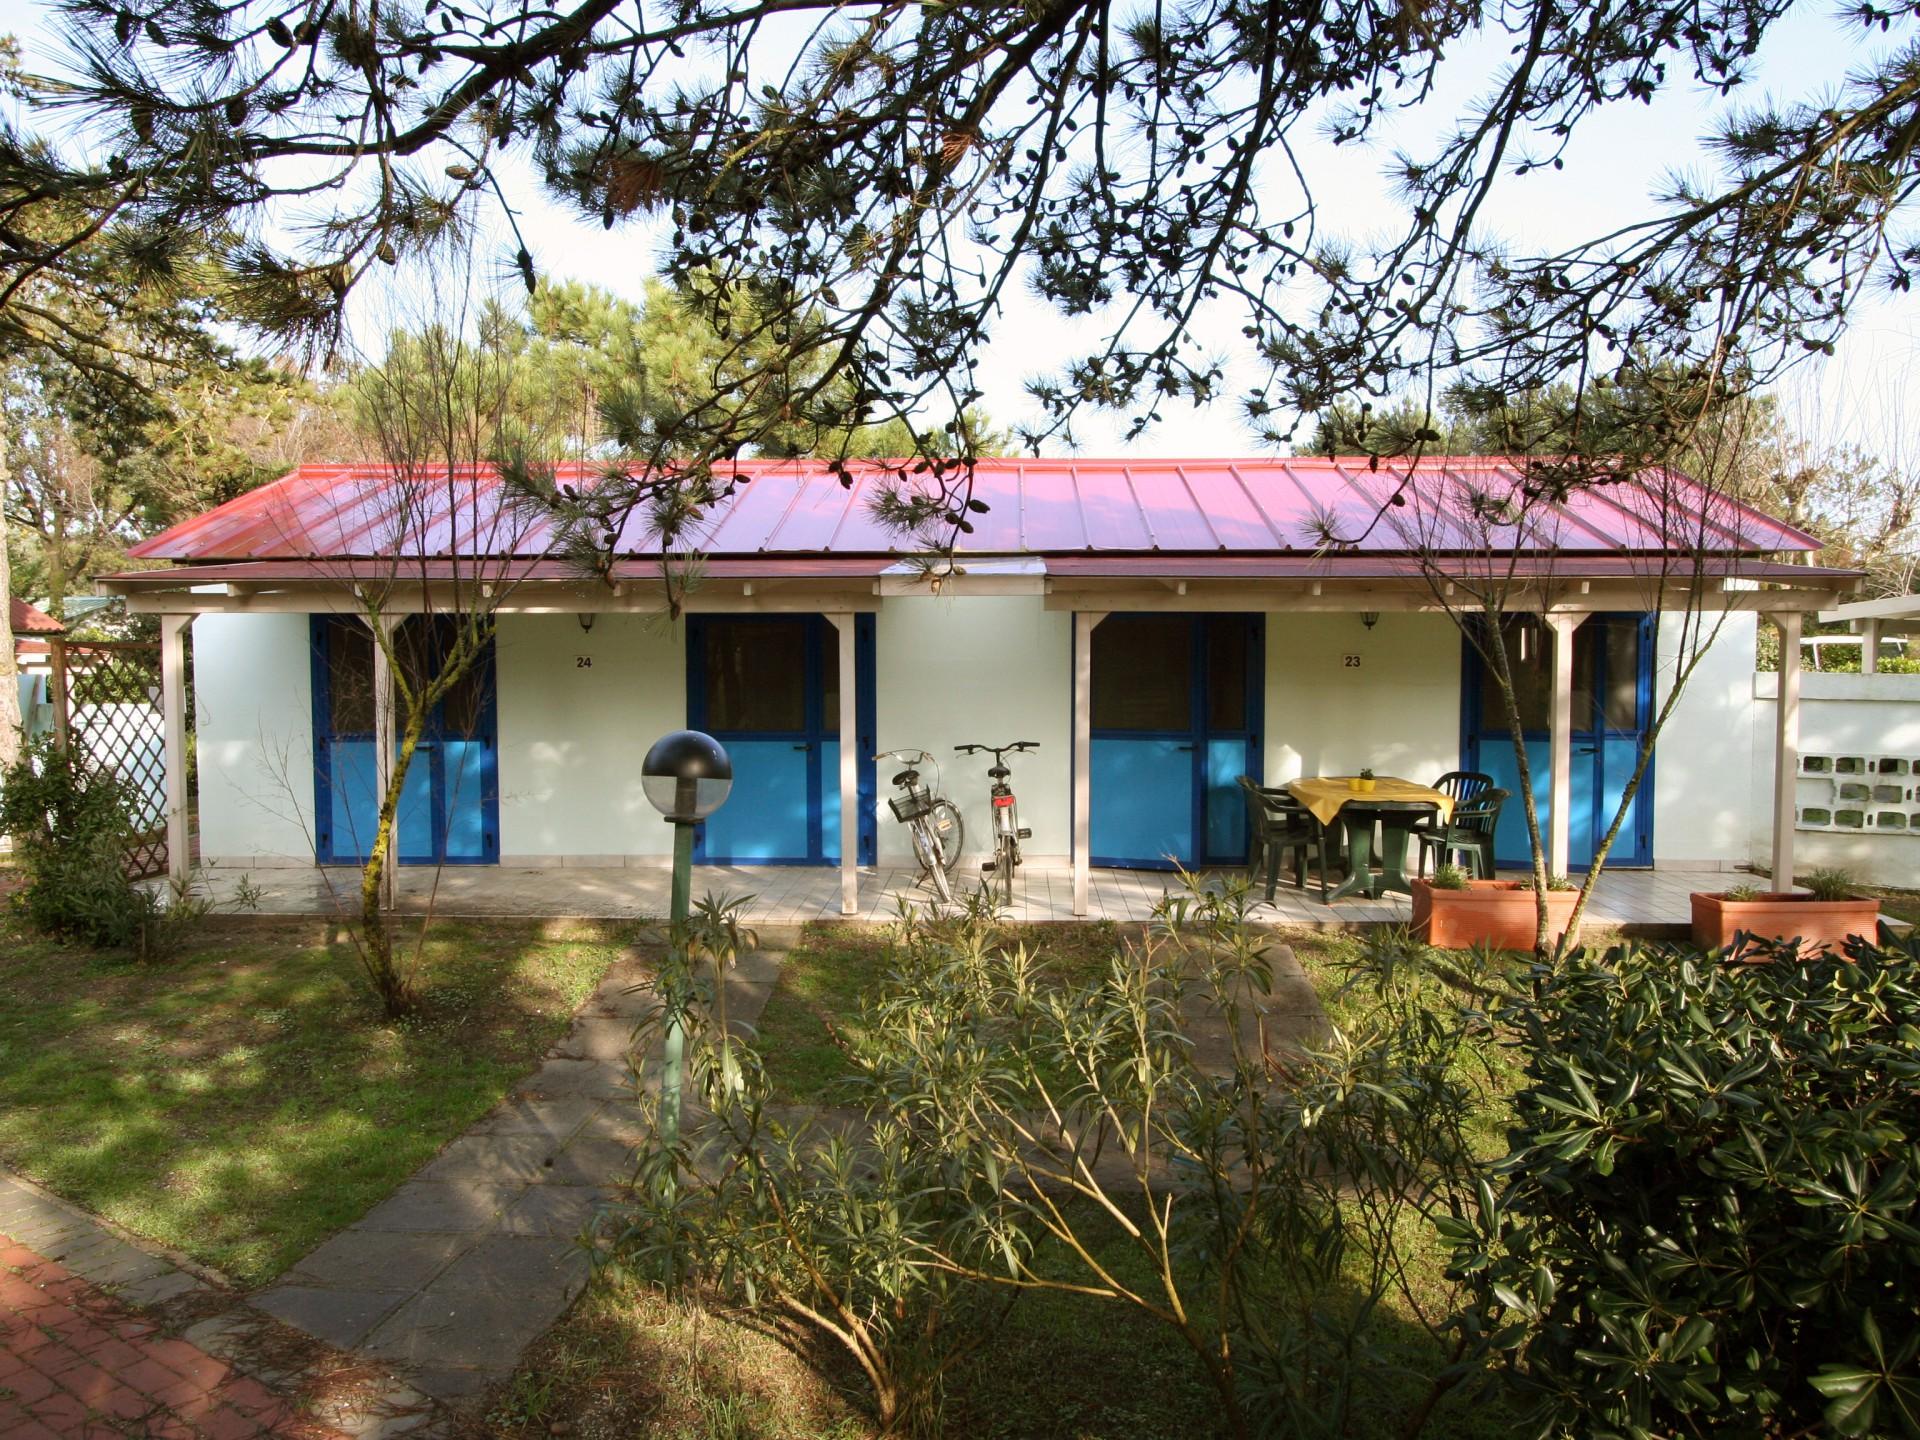 Bungalow bungalow 5 villaggio rosolina mare club for Www bungalow5 com